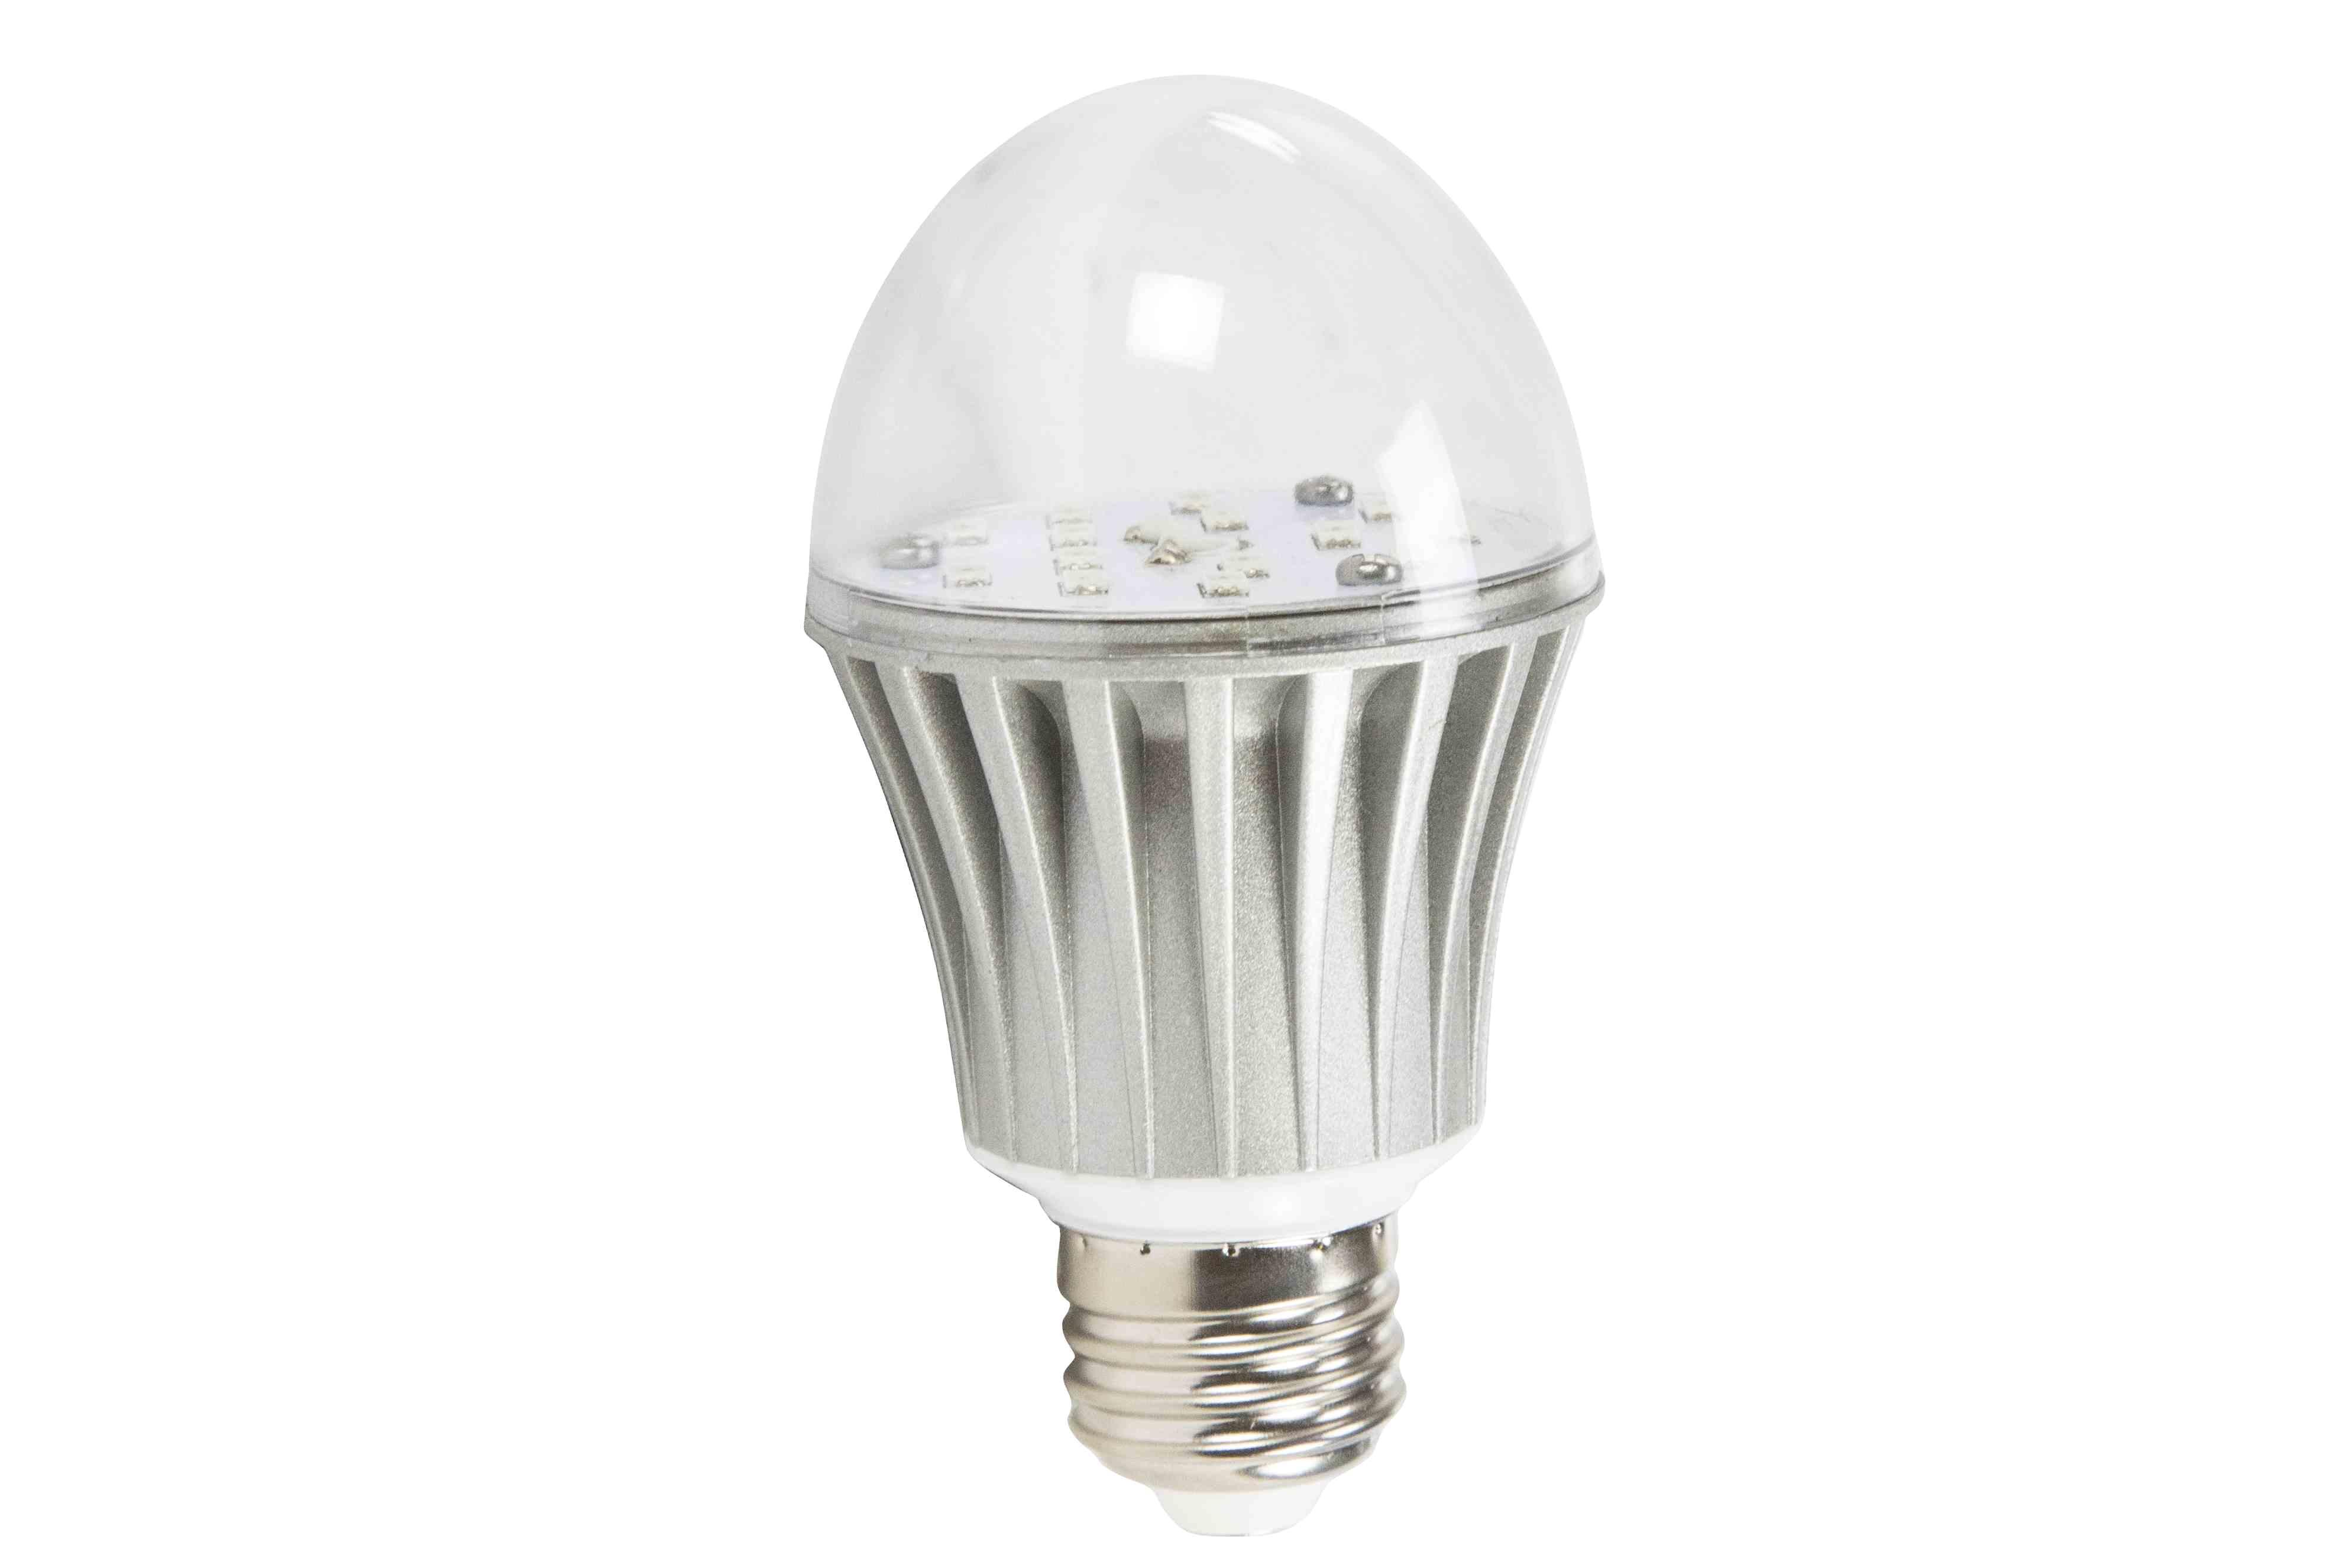 hi res image 4 strobing beacon led light bulb side angle